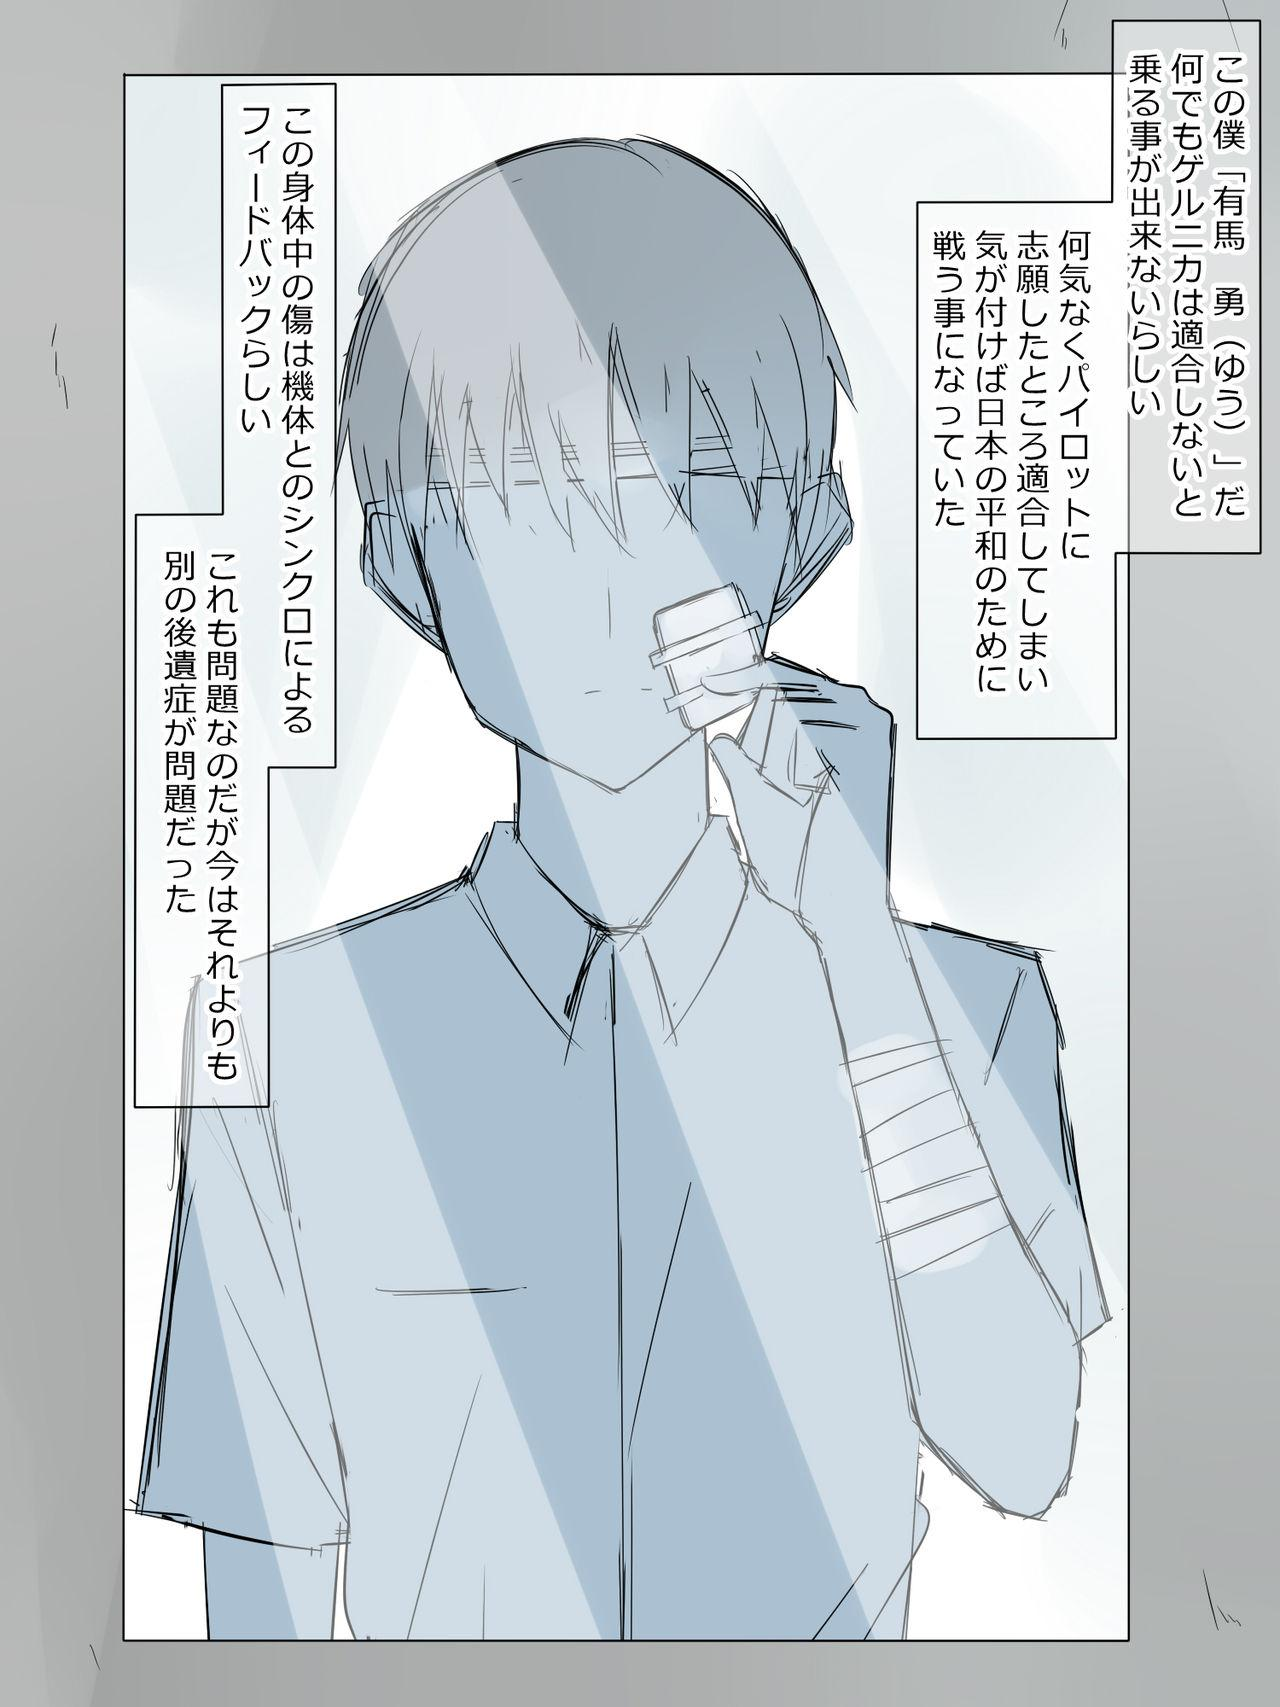 [Kagemusha] Arima-kun to 40-nin no Classmate 1